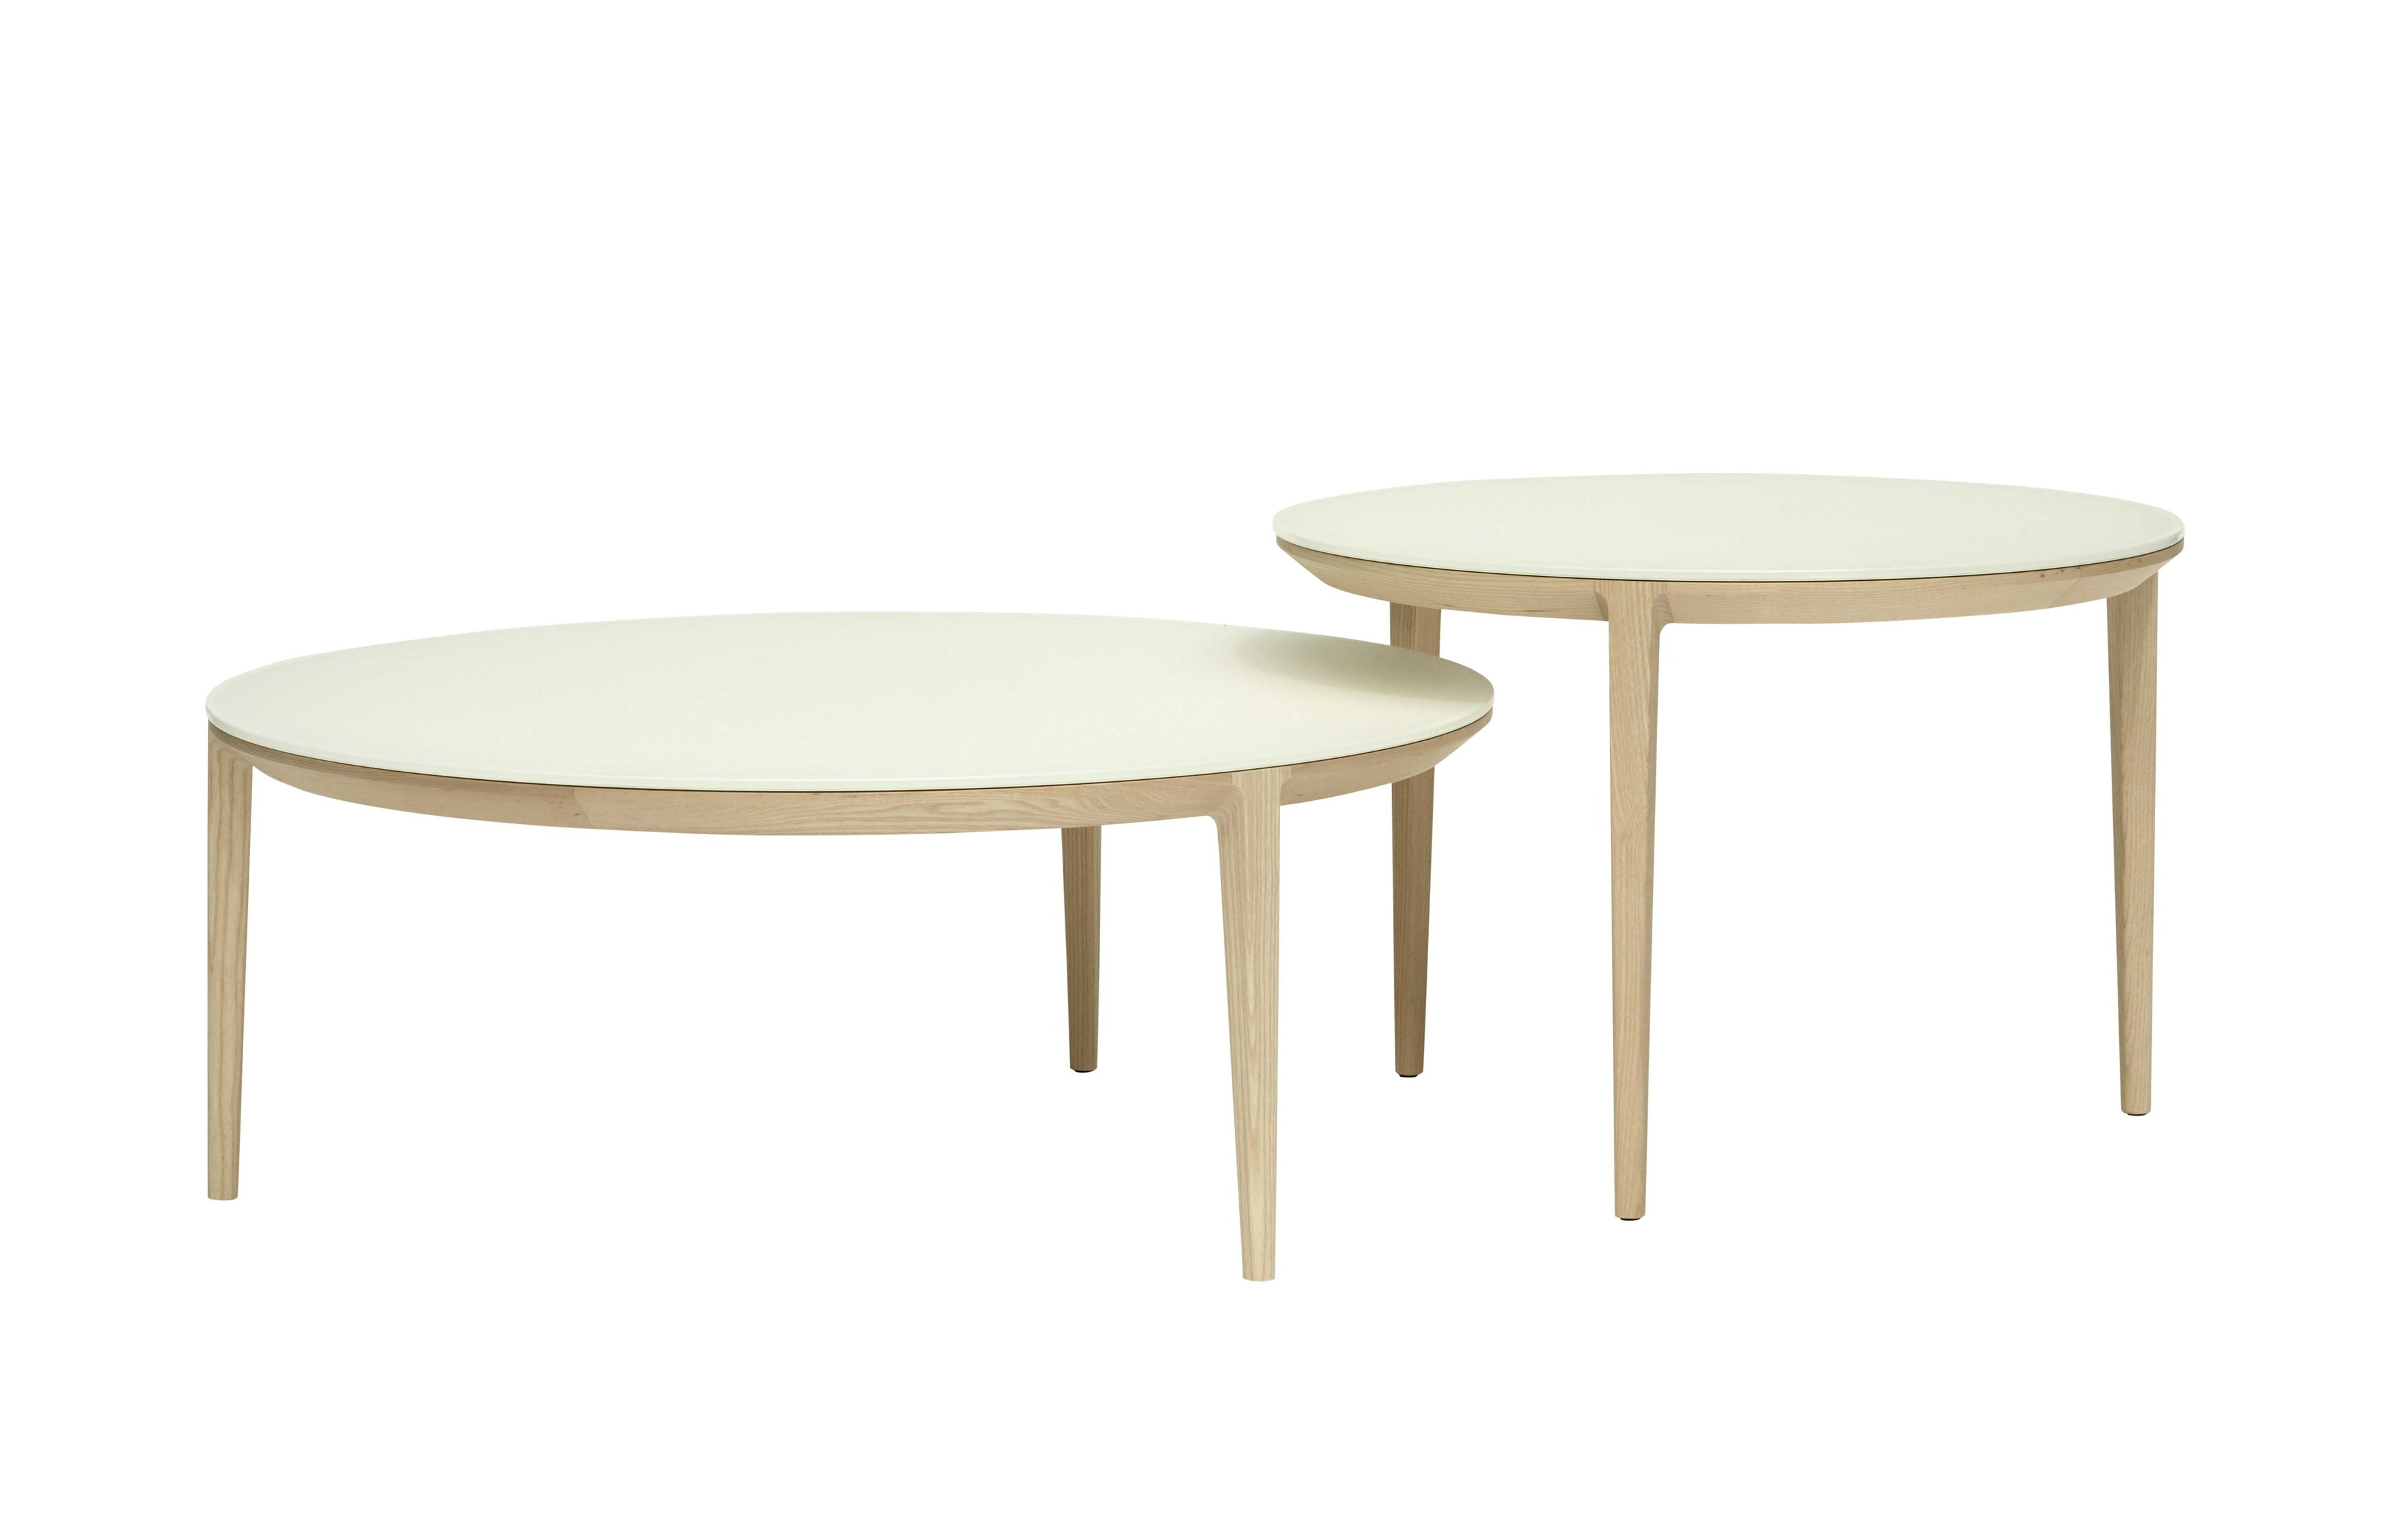 ETOILE Couchtisch aus Holz by SP01 Design Metrica